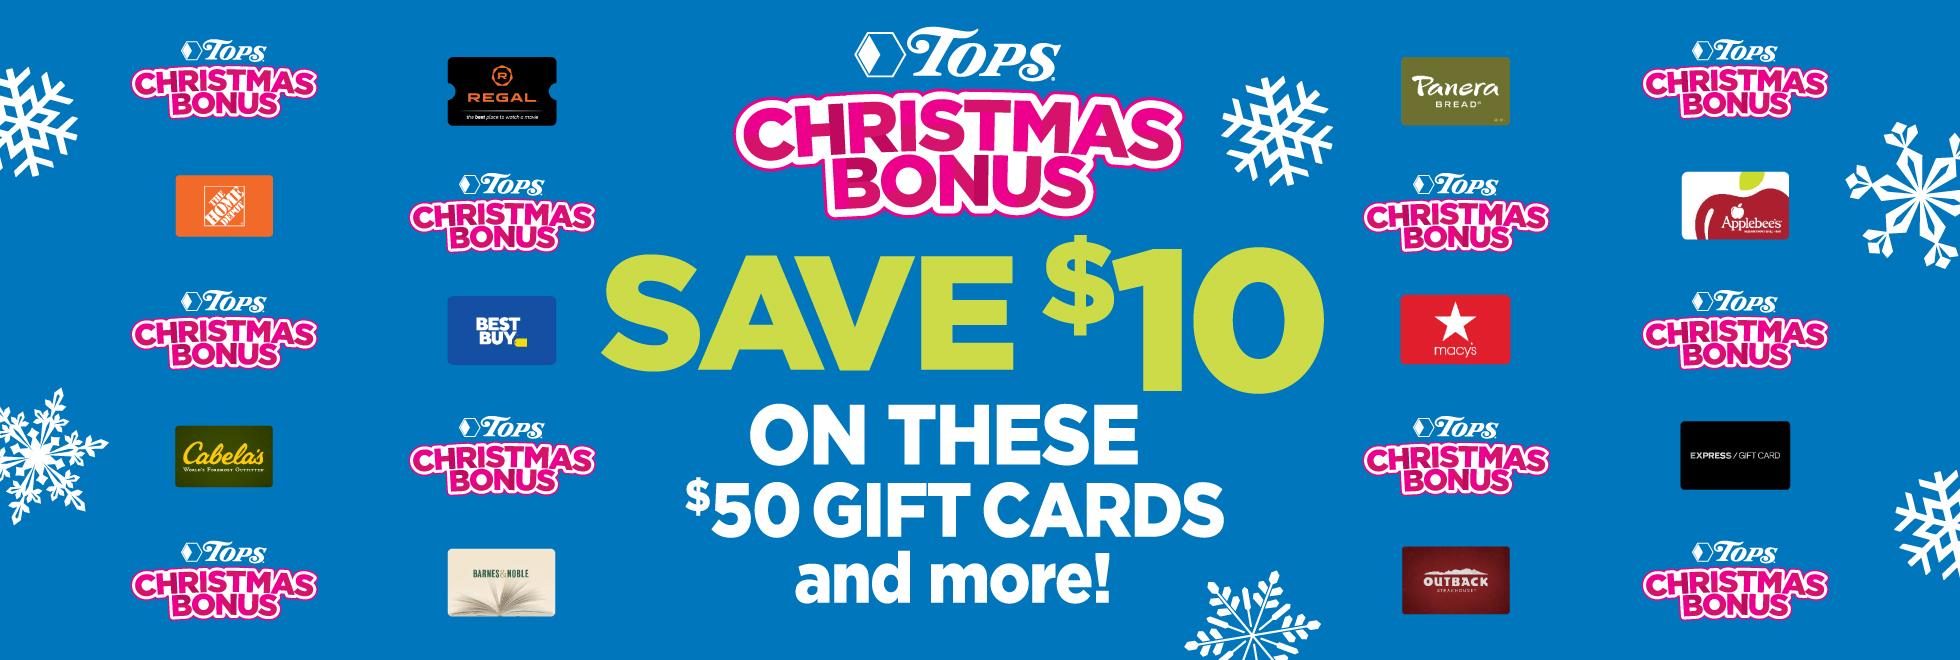 Christmas Bonuss